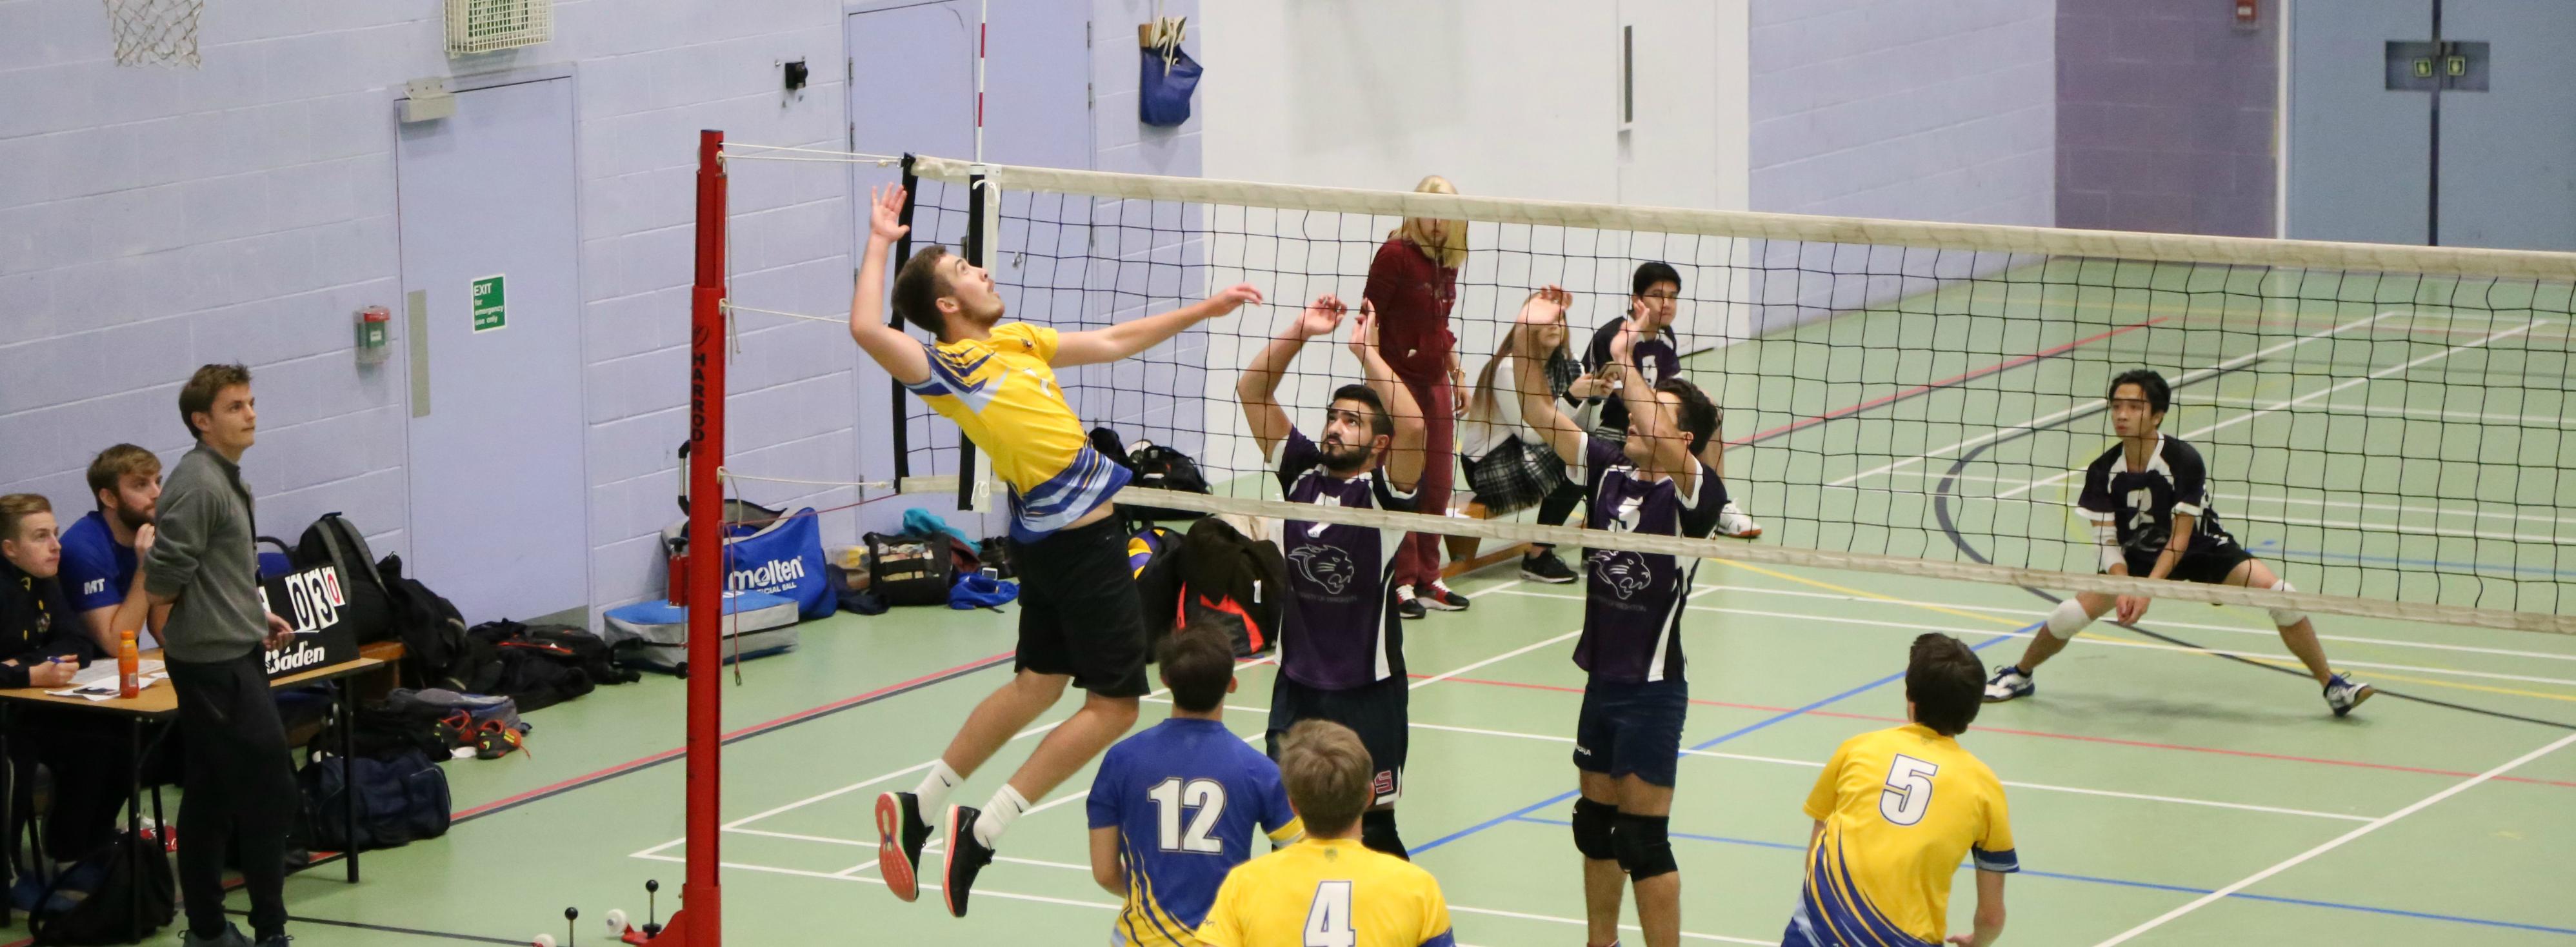 gym.volleyball